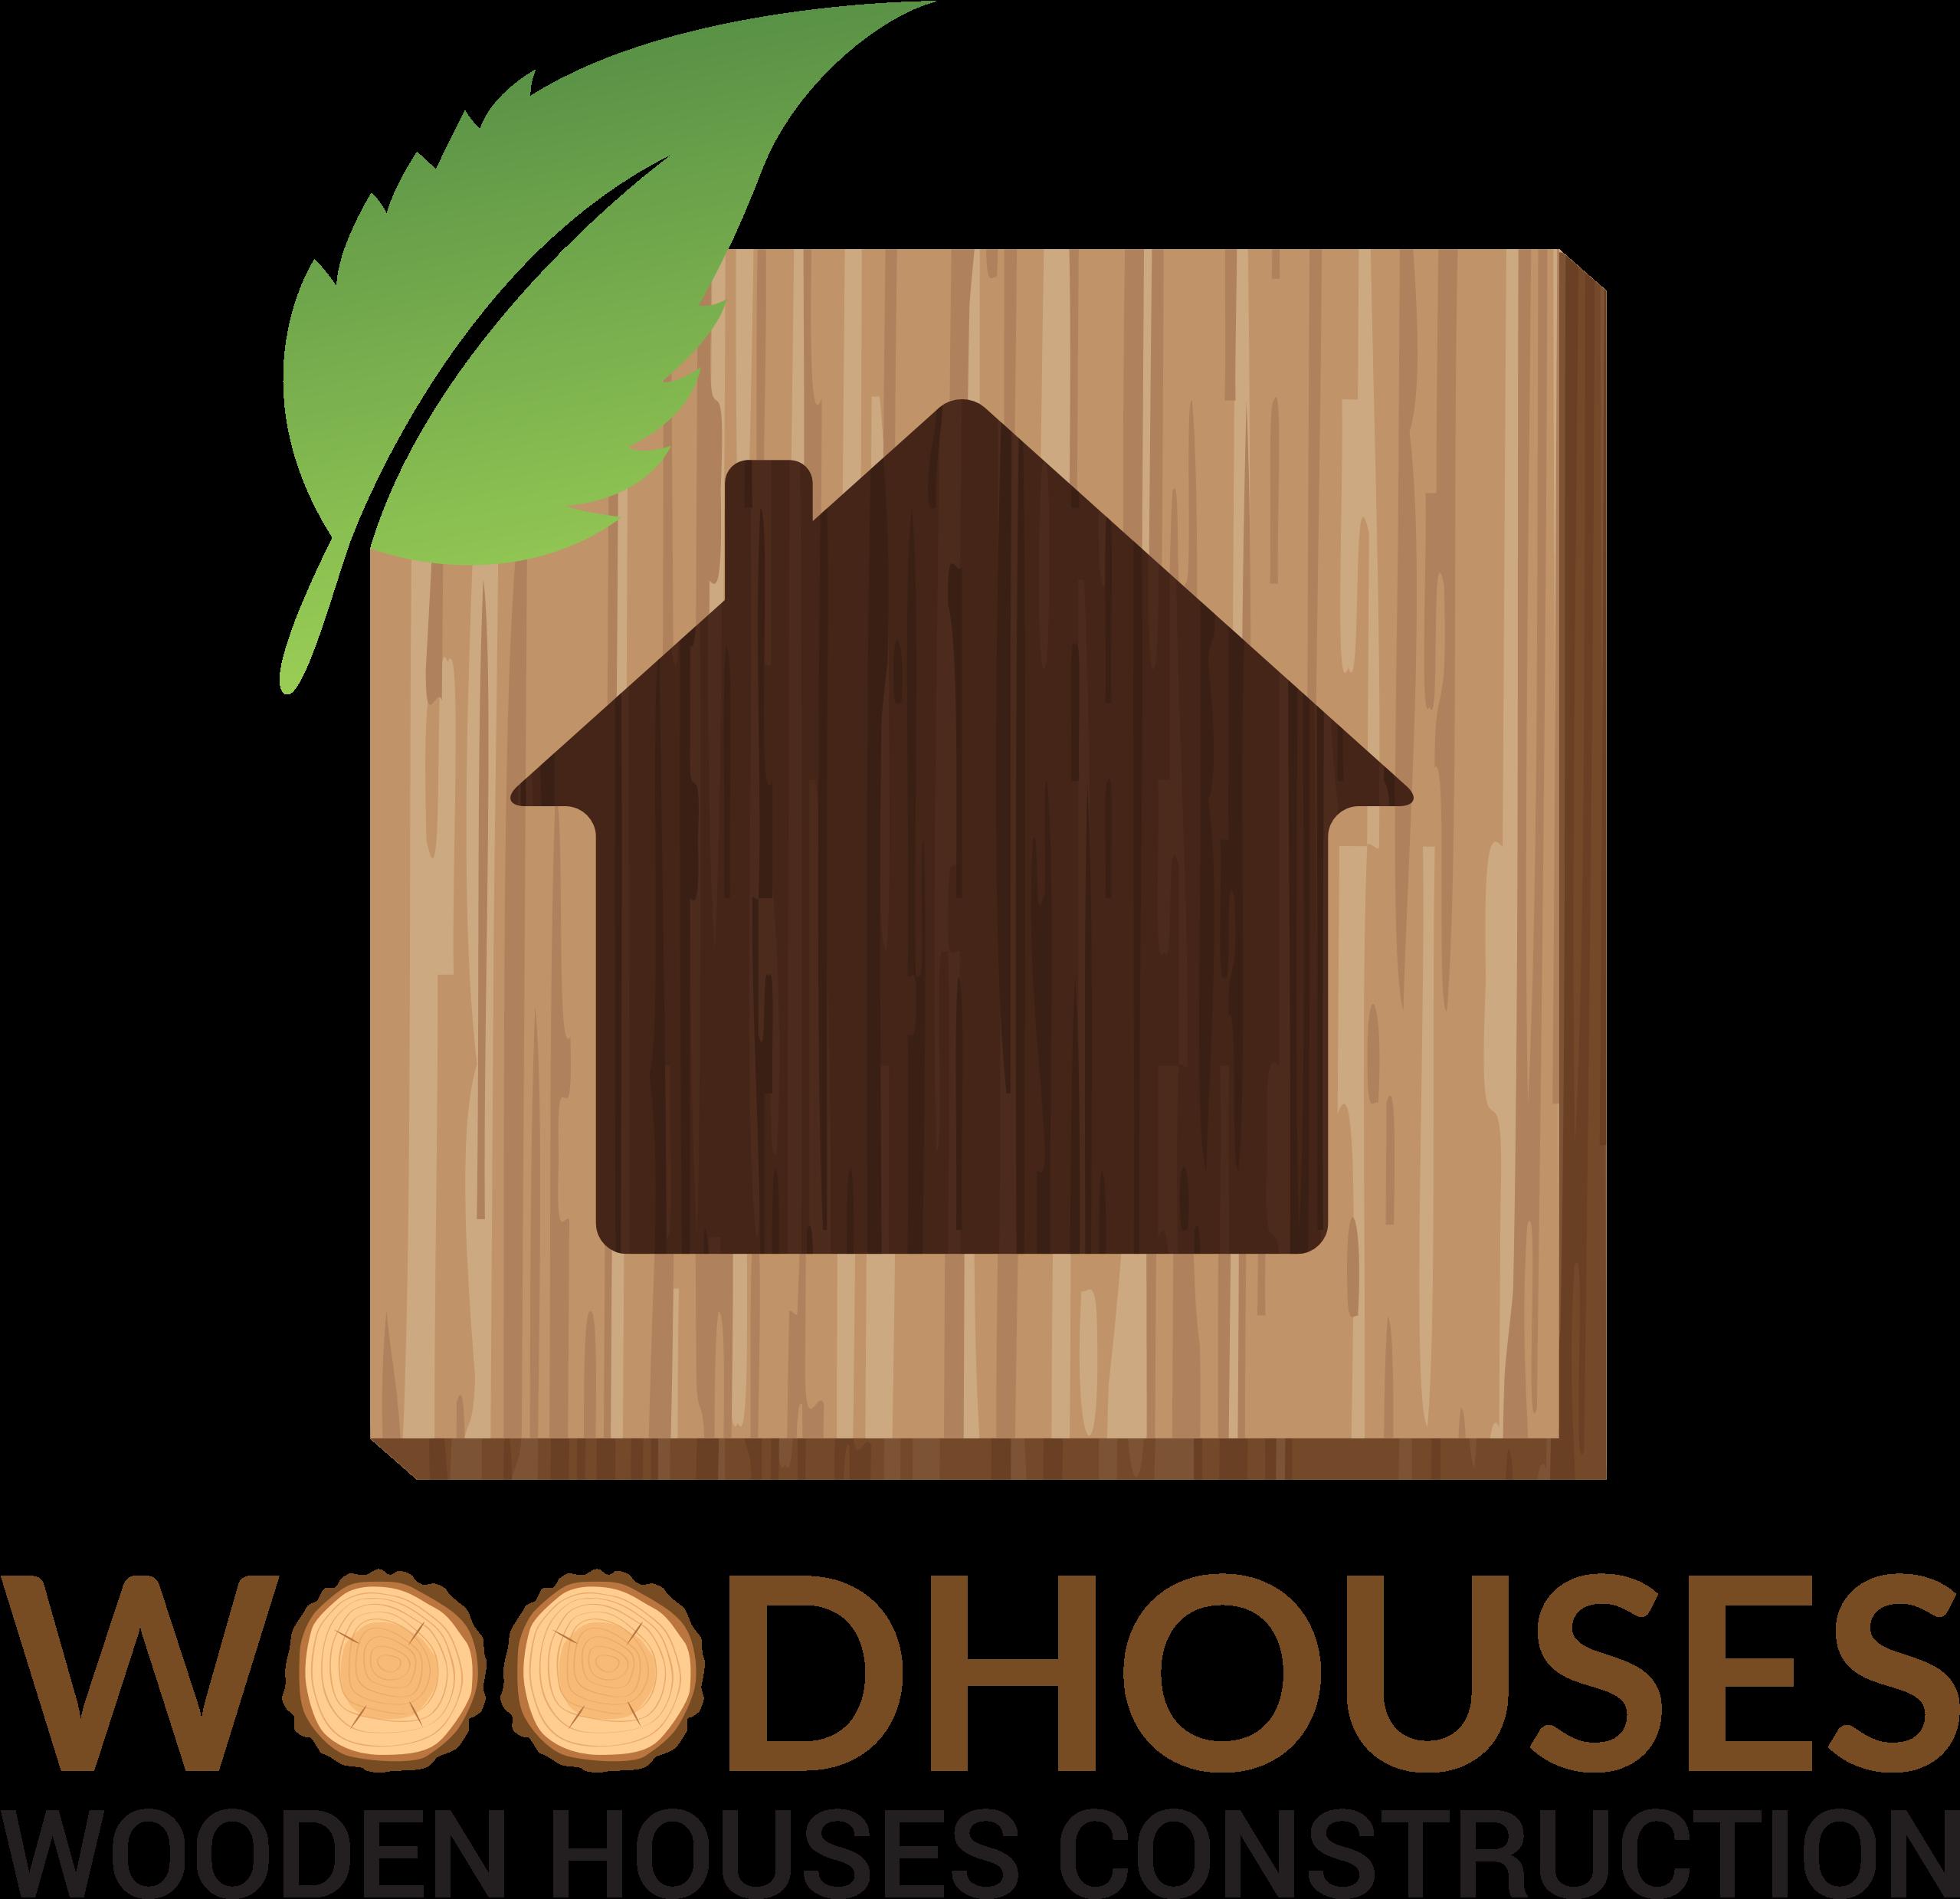 www.woodhouses.ee logo